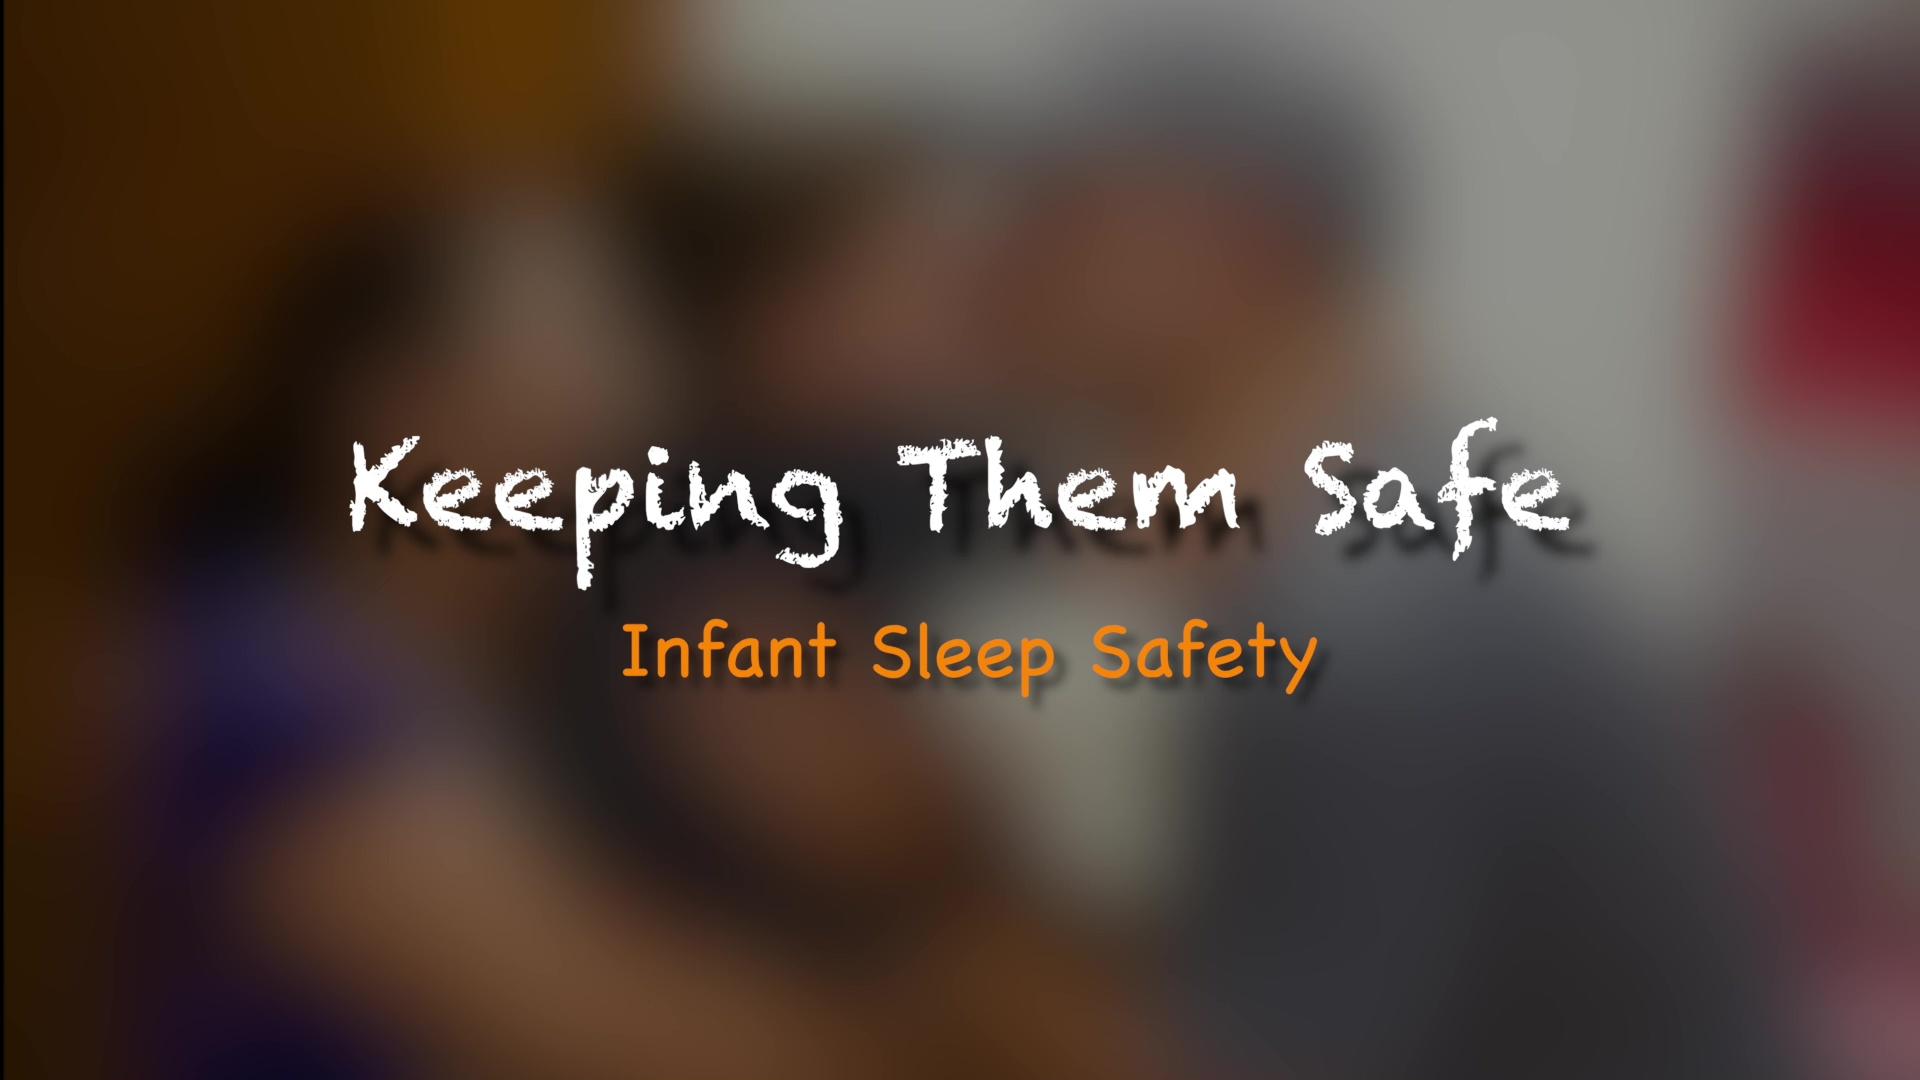 Infant Sleep Safety